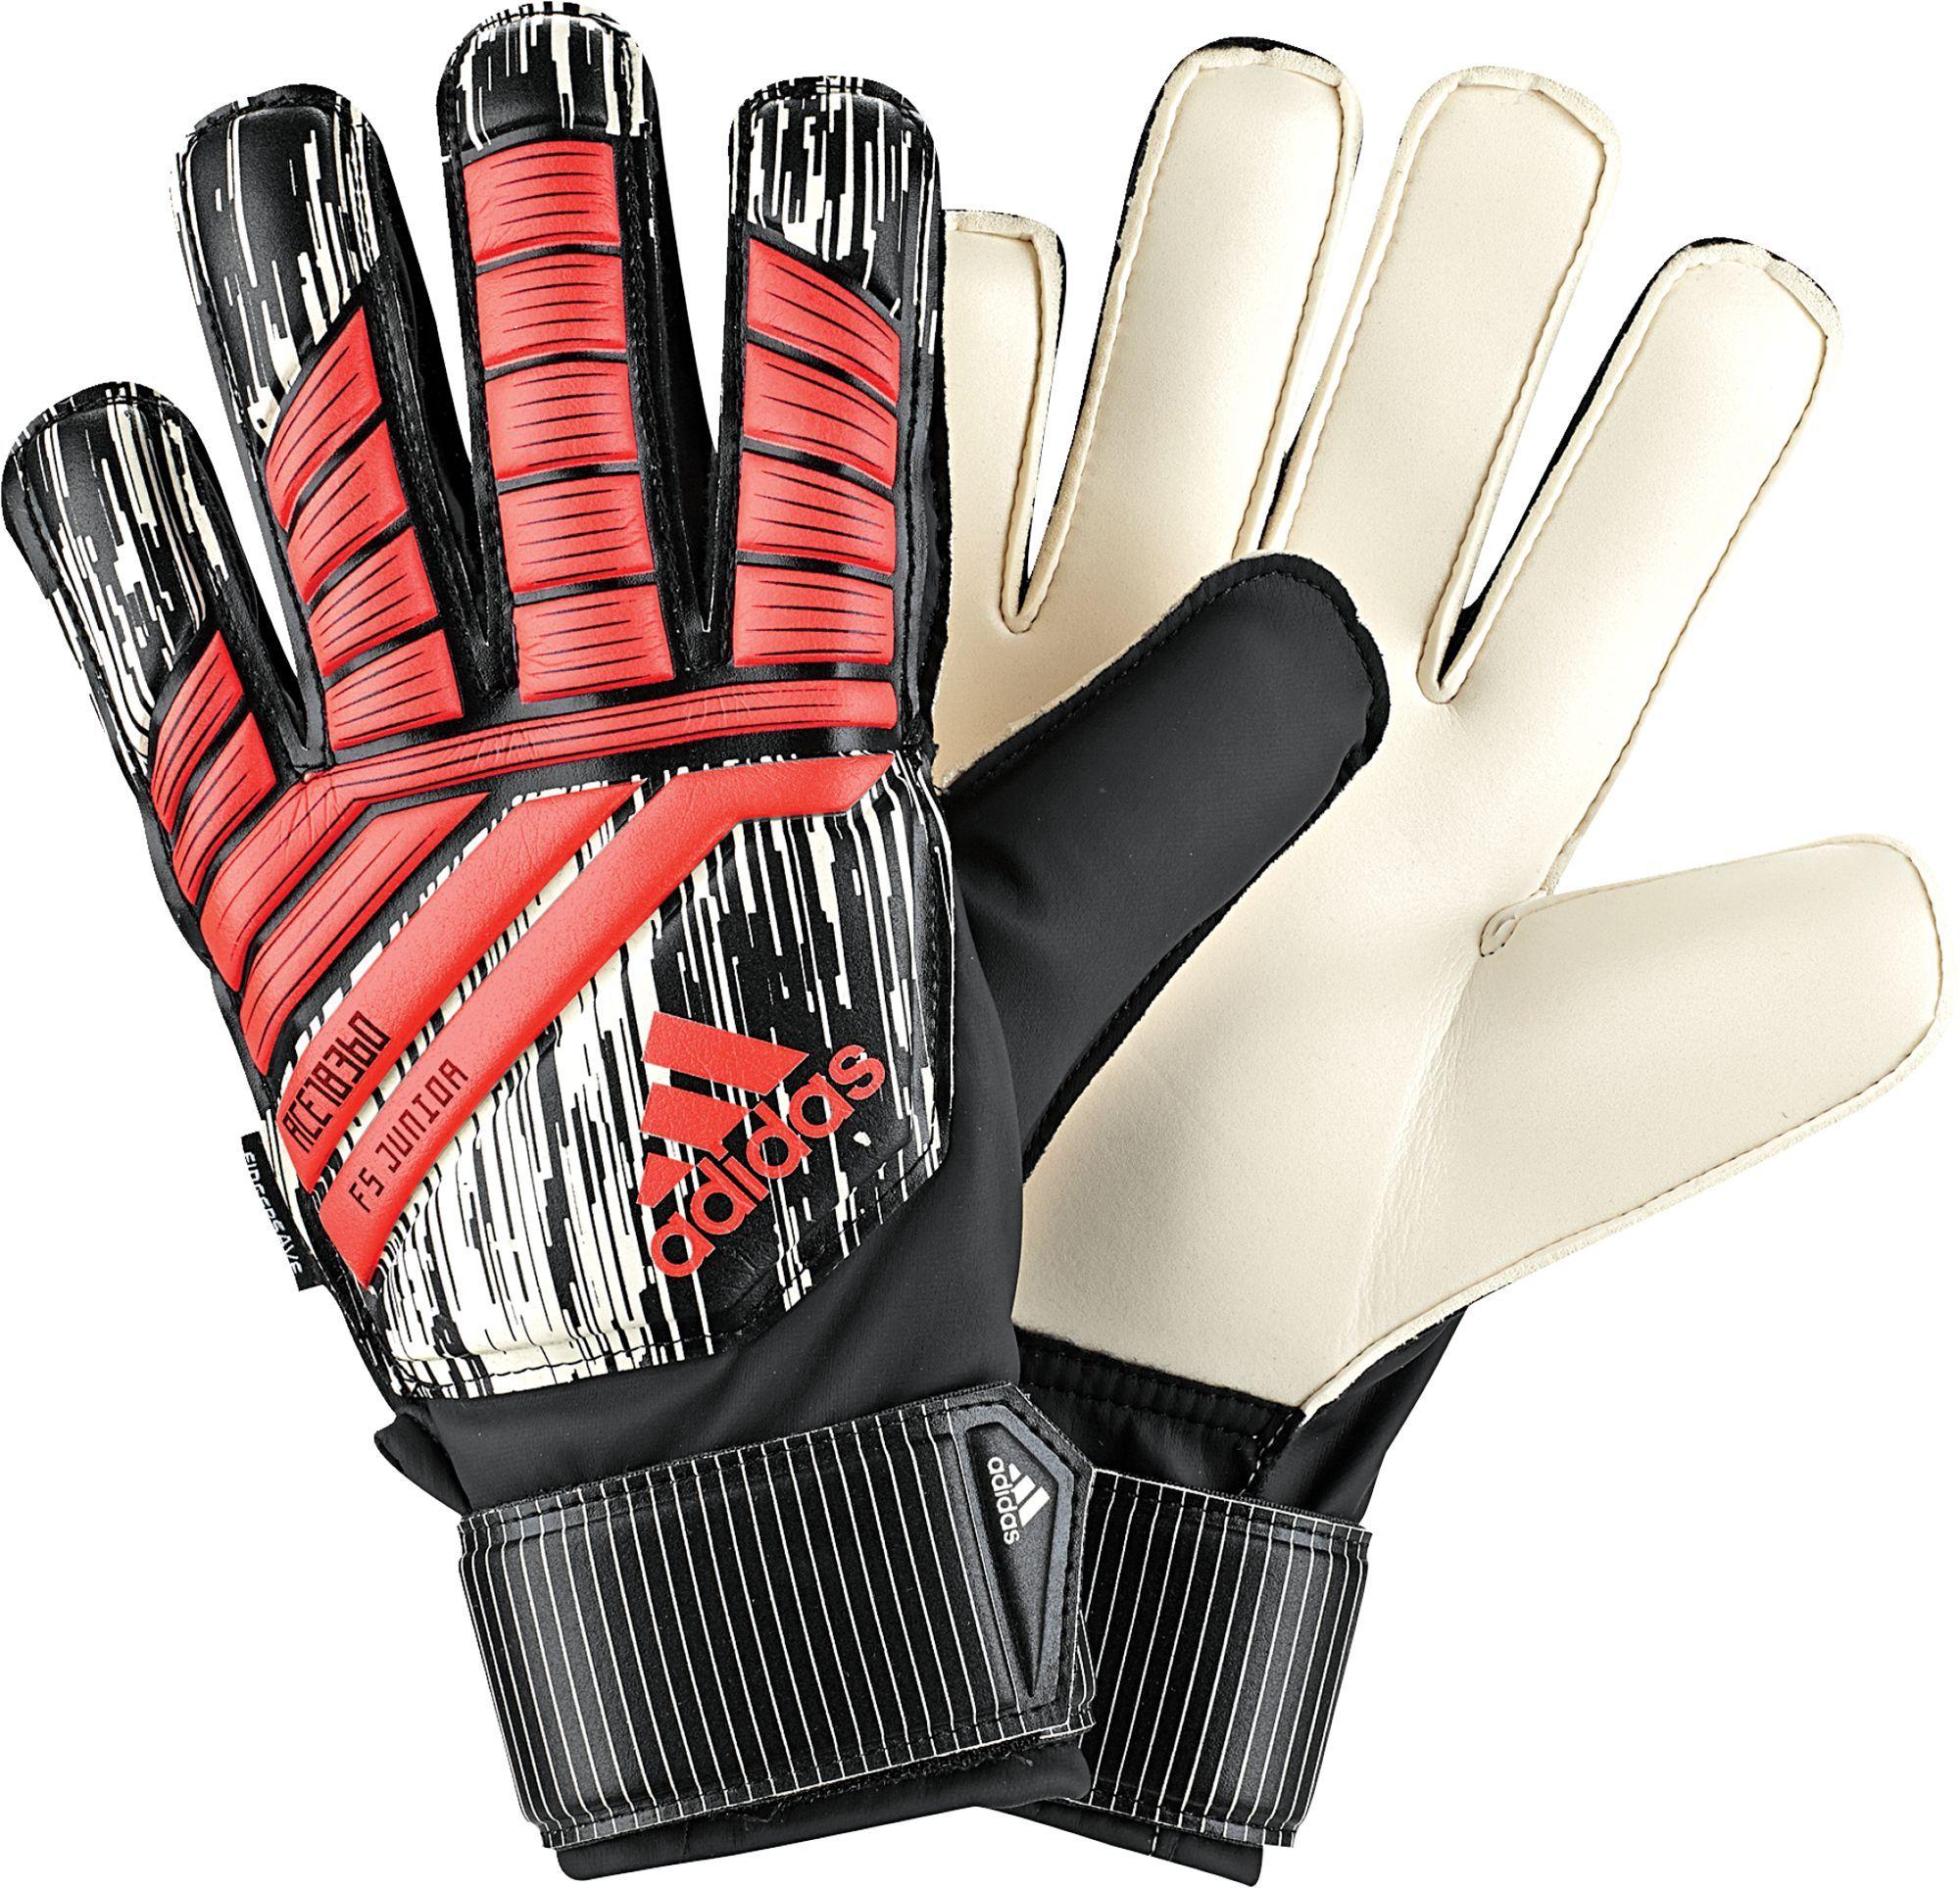 16ed87cf9a98 adidas Predator Fingersave Junior Soccer Goalkeeper Gloves